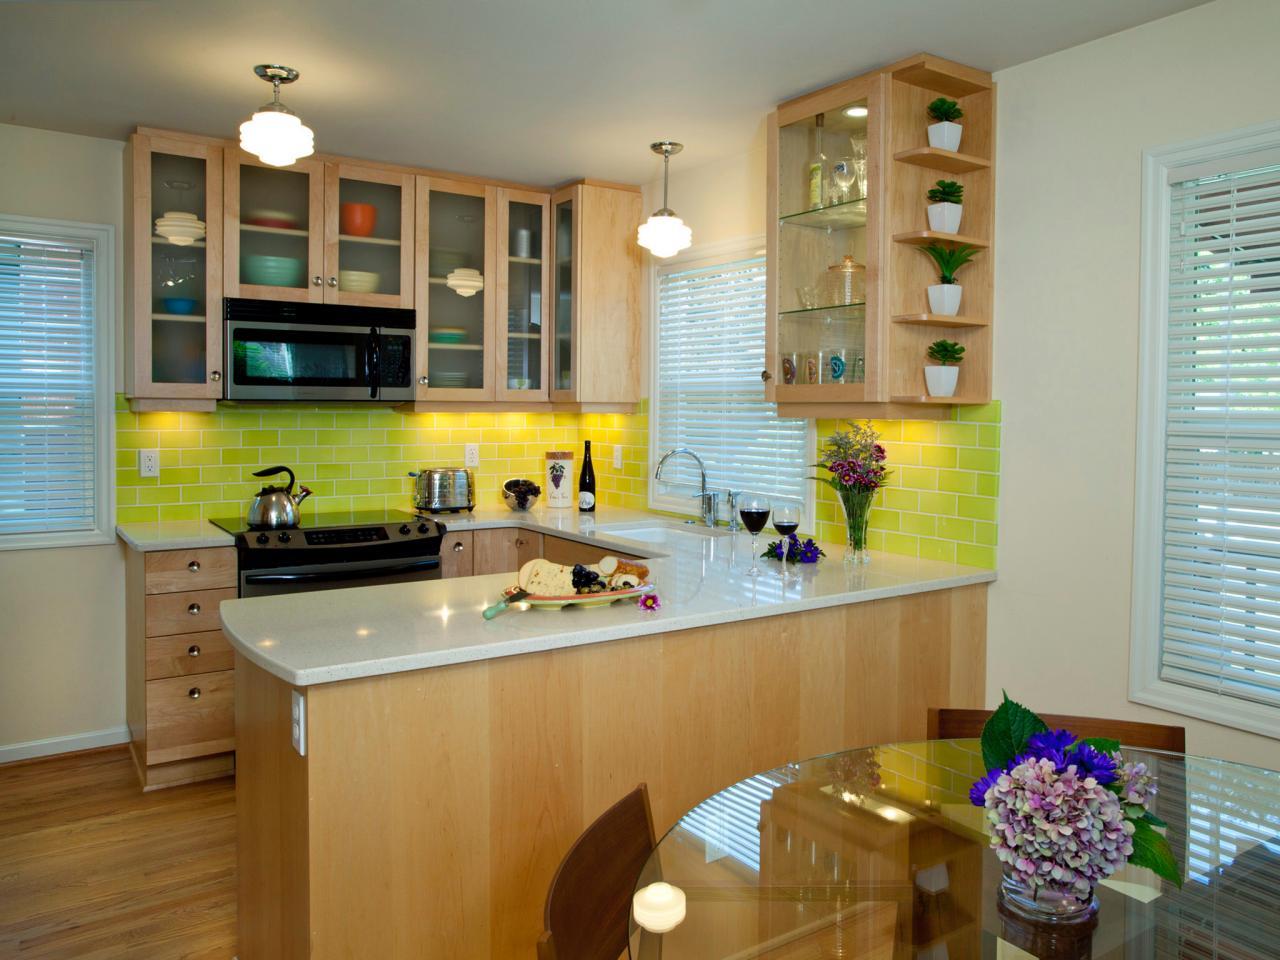 hgtv u shaped kitchen designs photo - 3